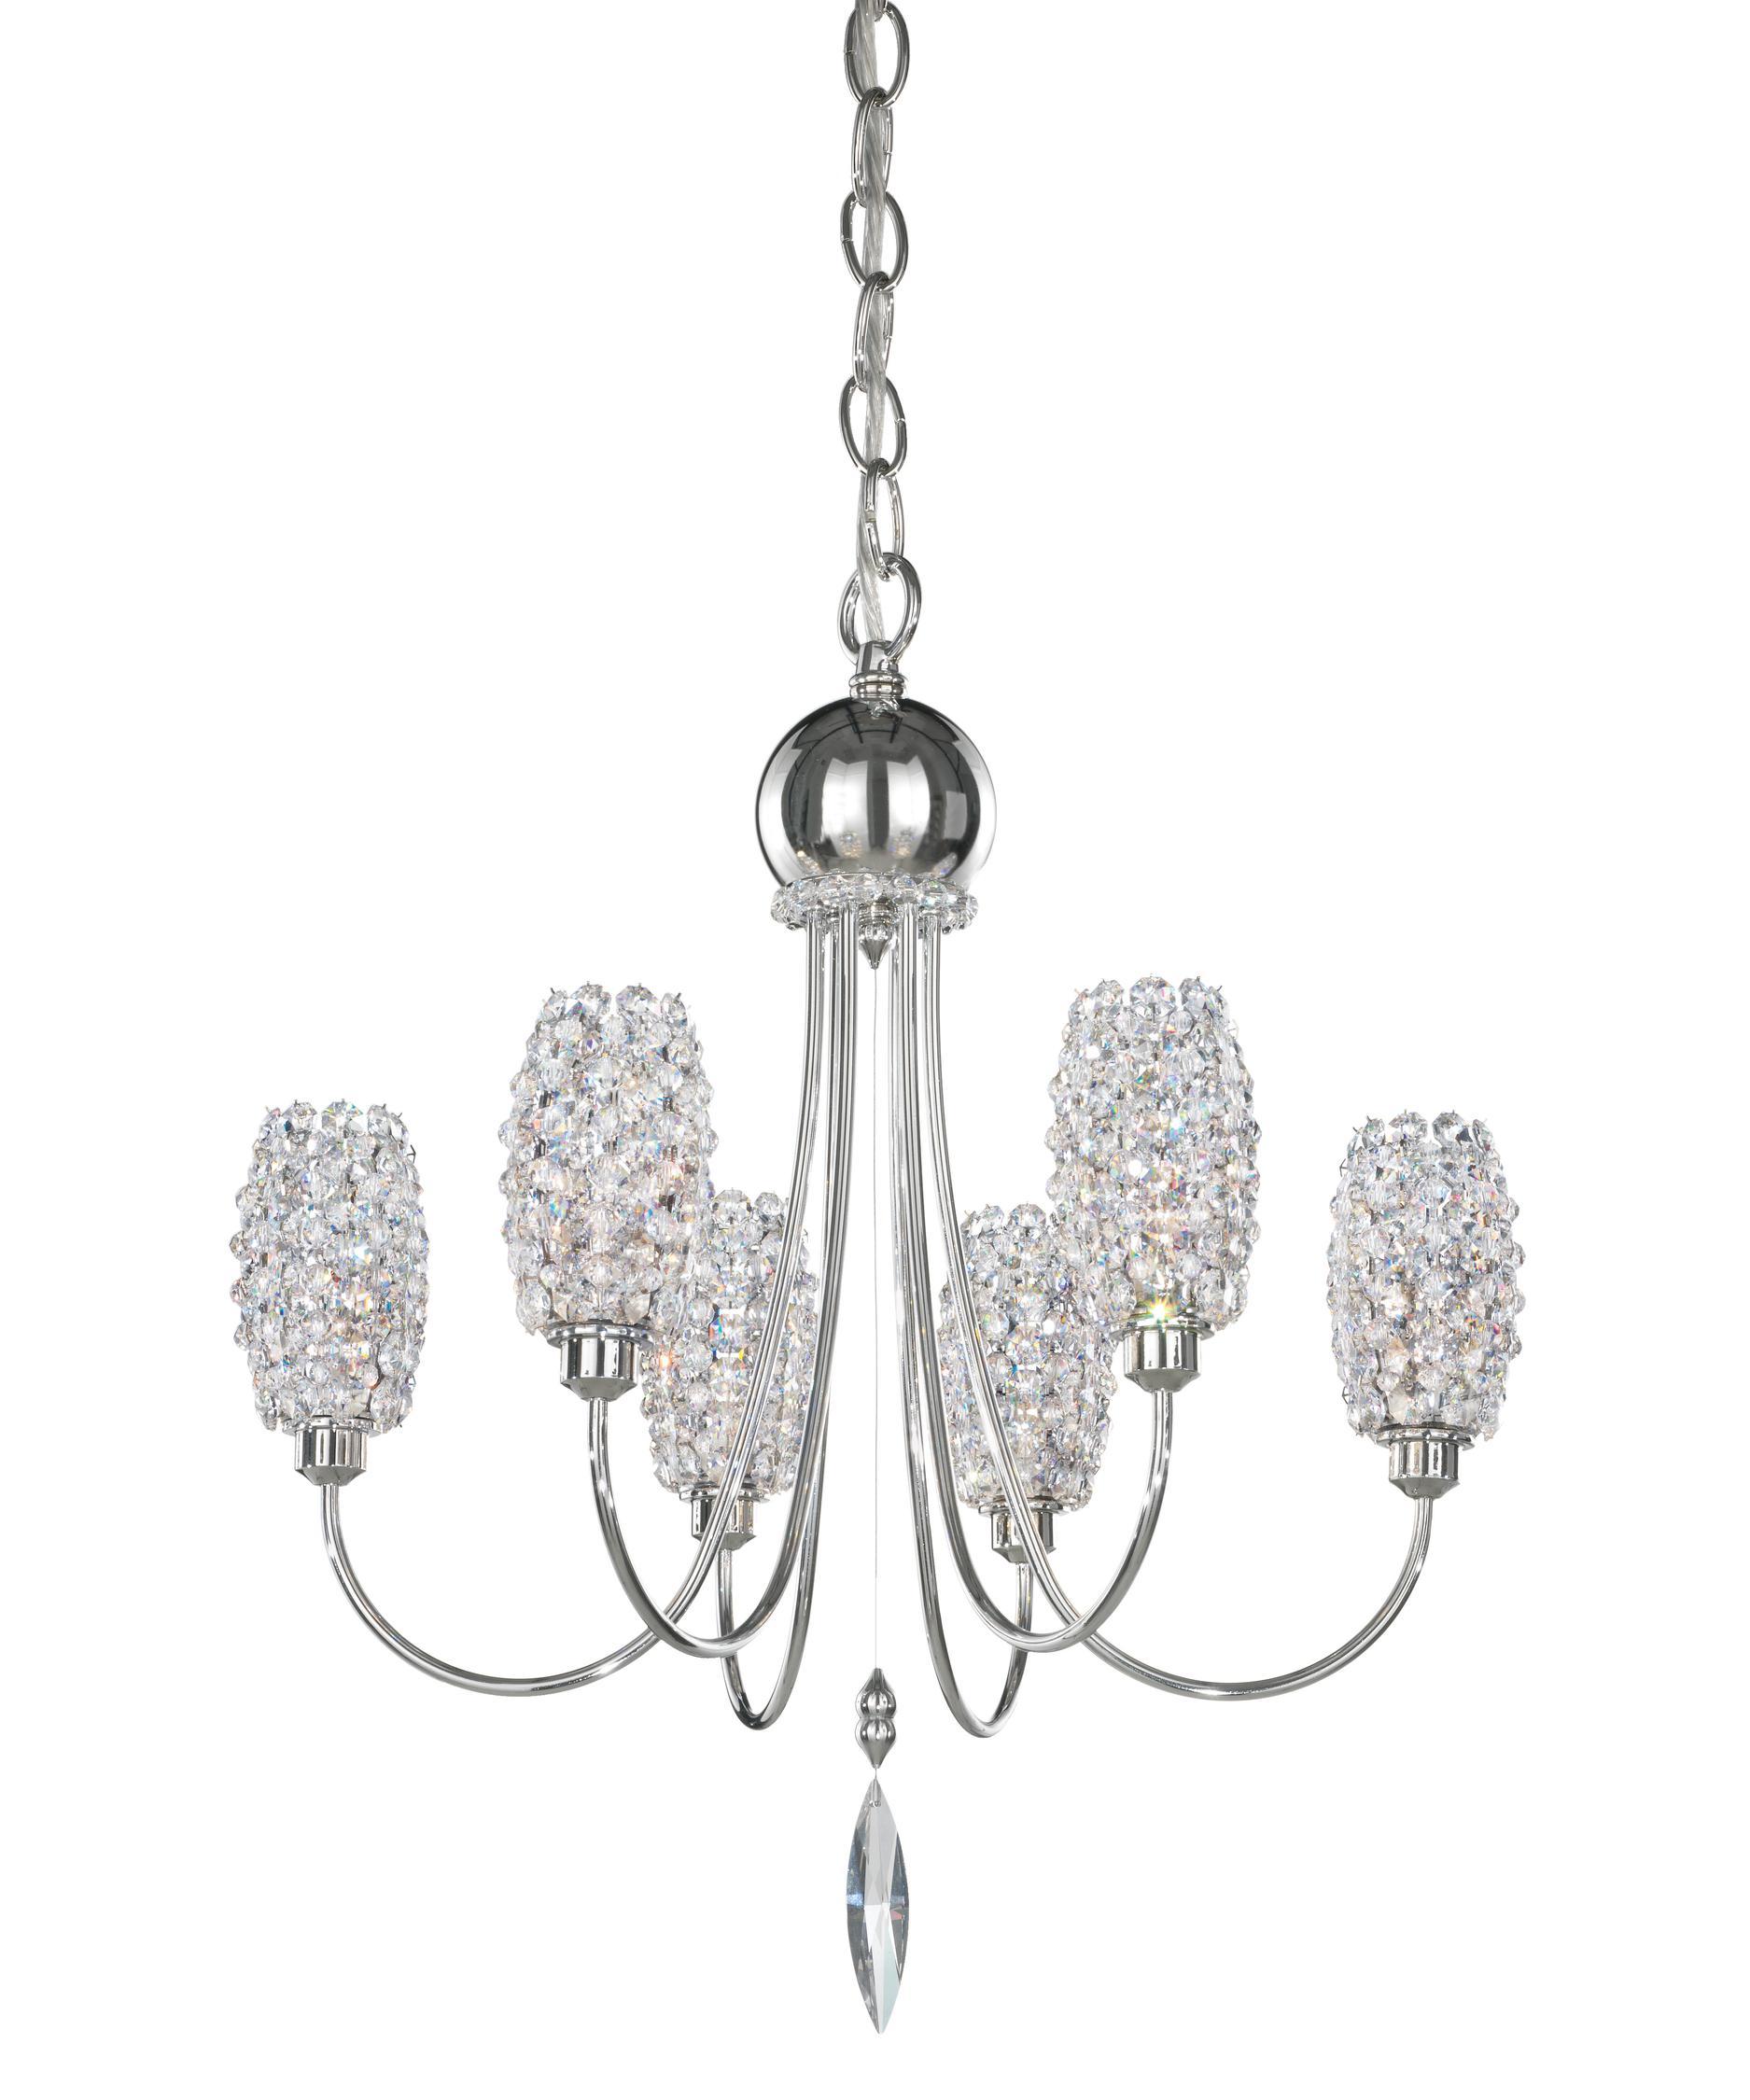 geometrix by schonbek di1619 dionyx 16 inch wide 6 light mini chandelier capitol lighting - Schonbek